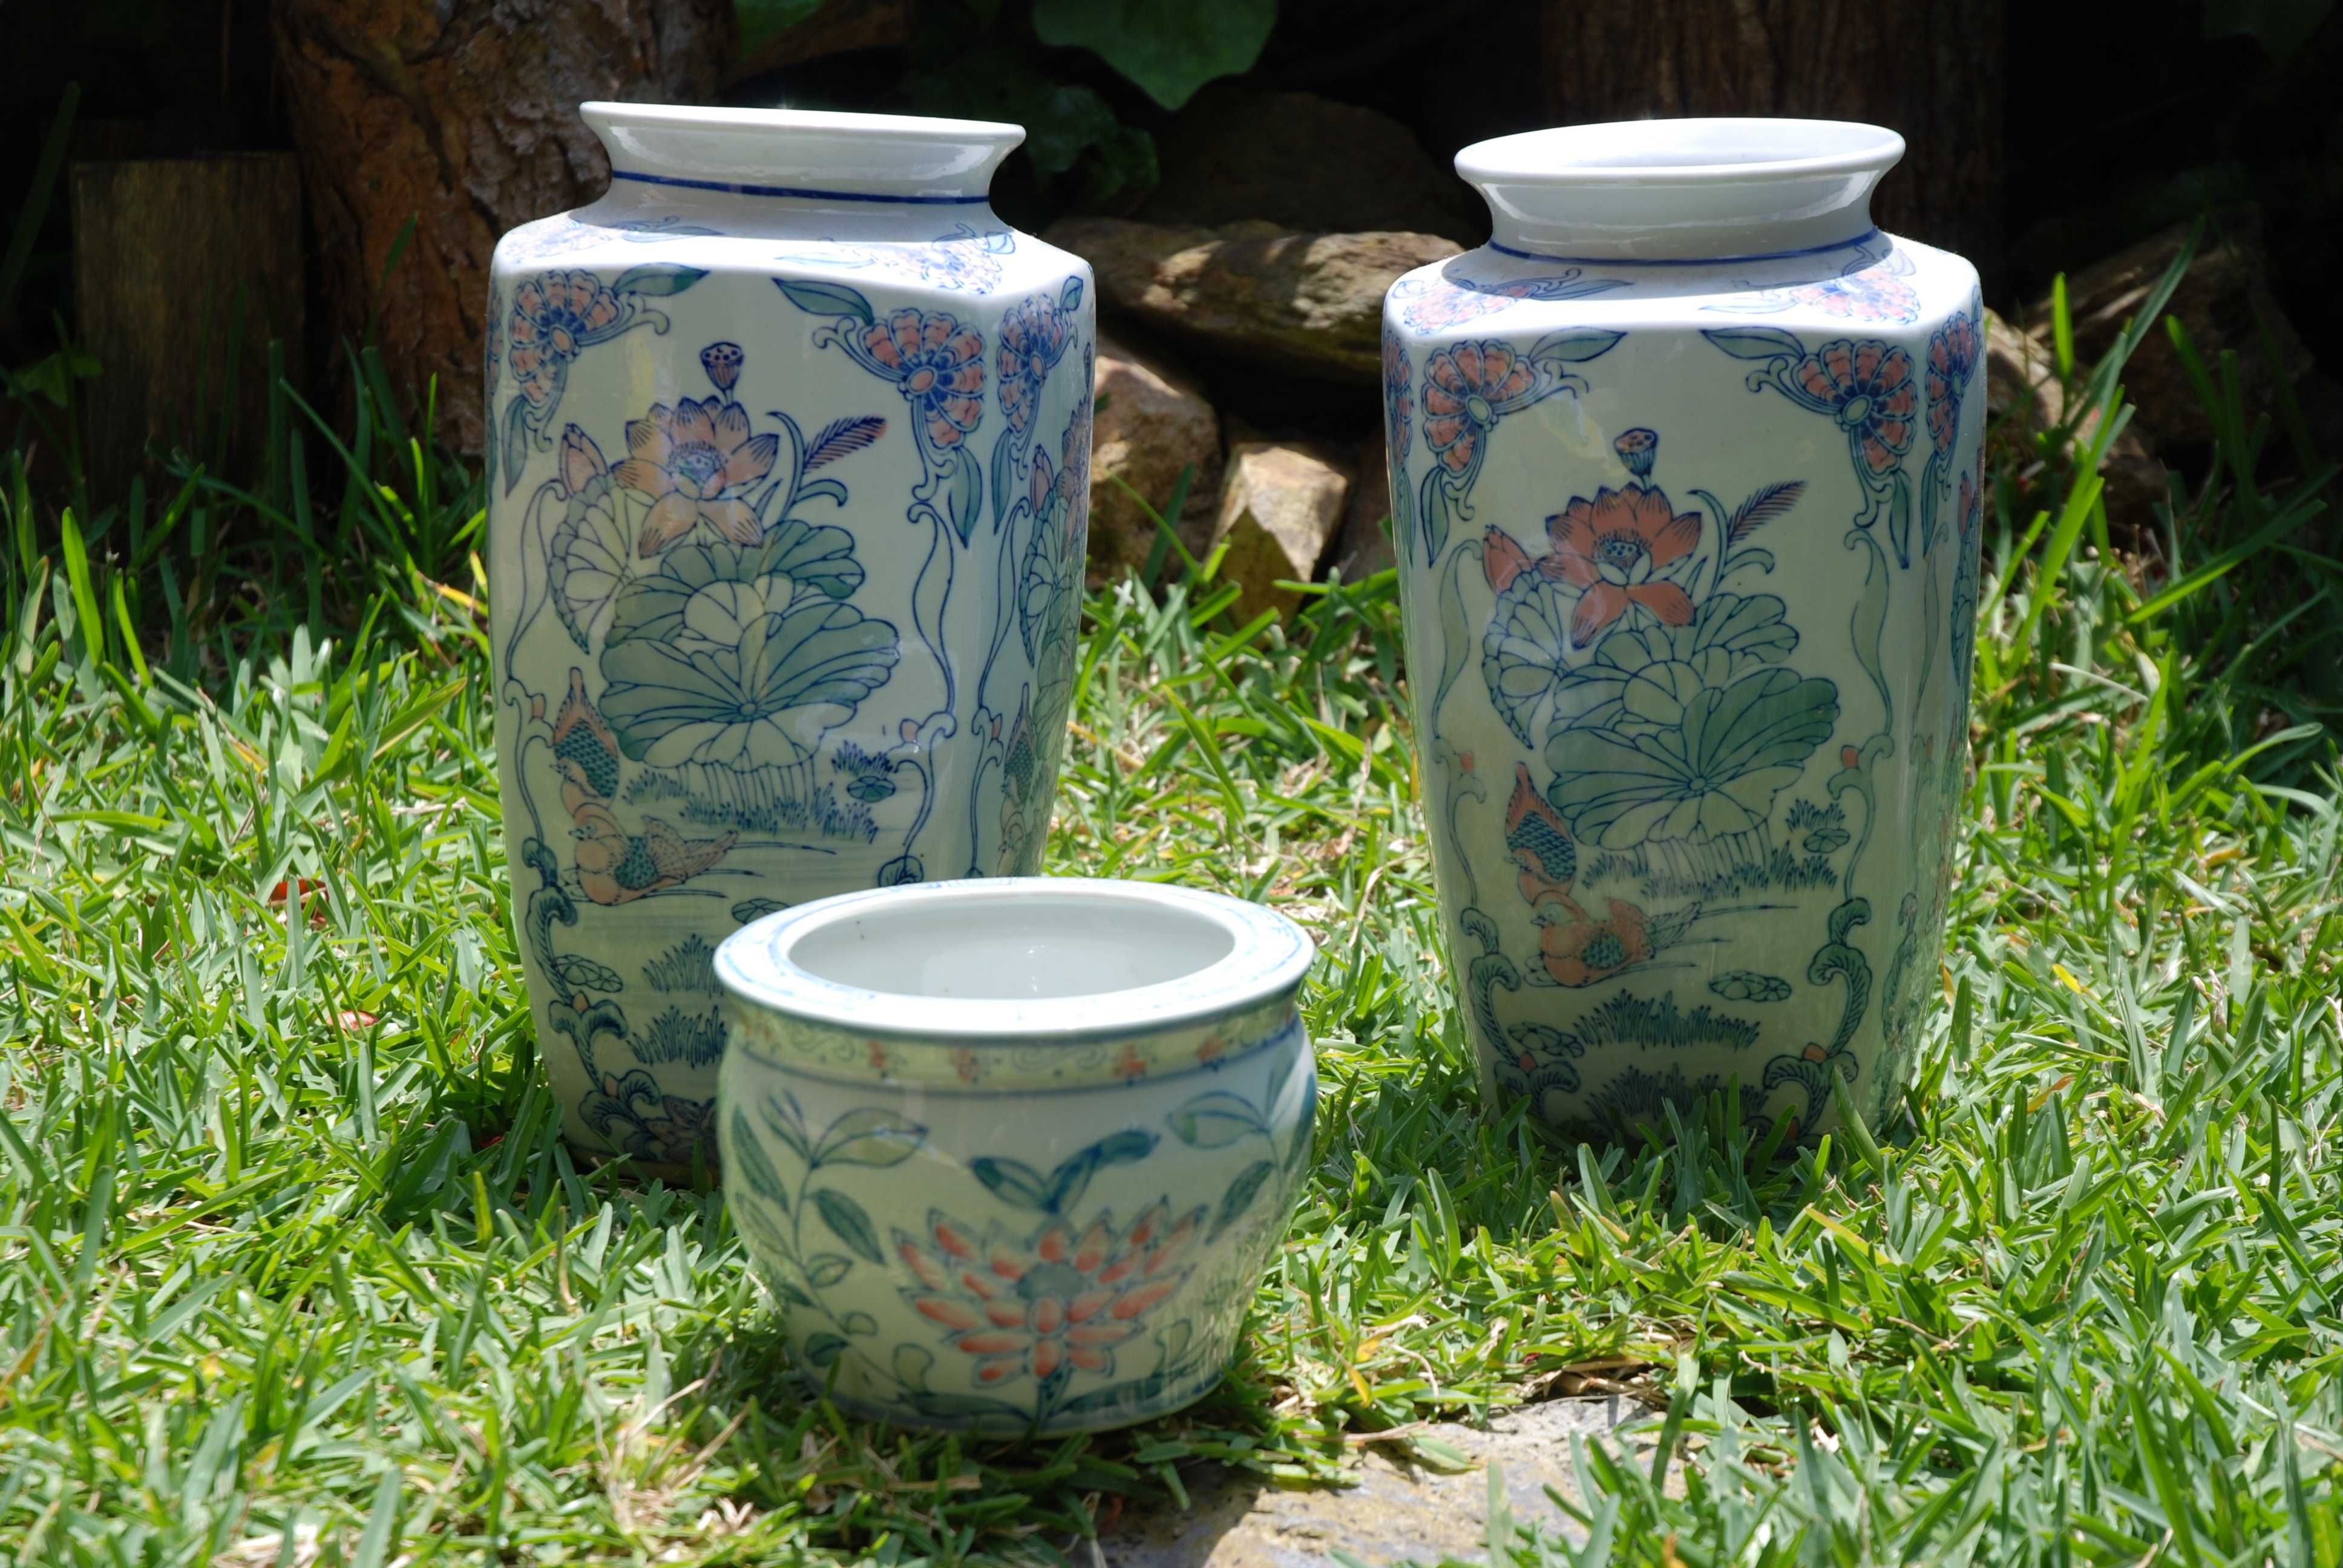 Par de jarrões e cachepot porcelana de Macau